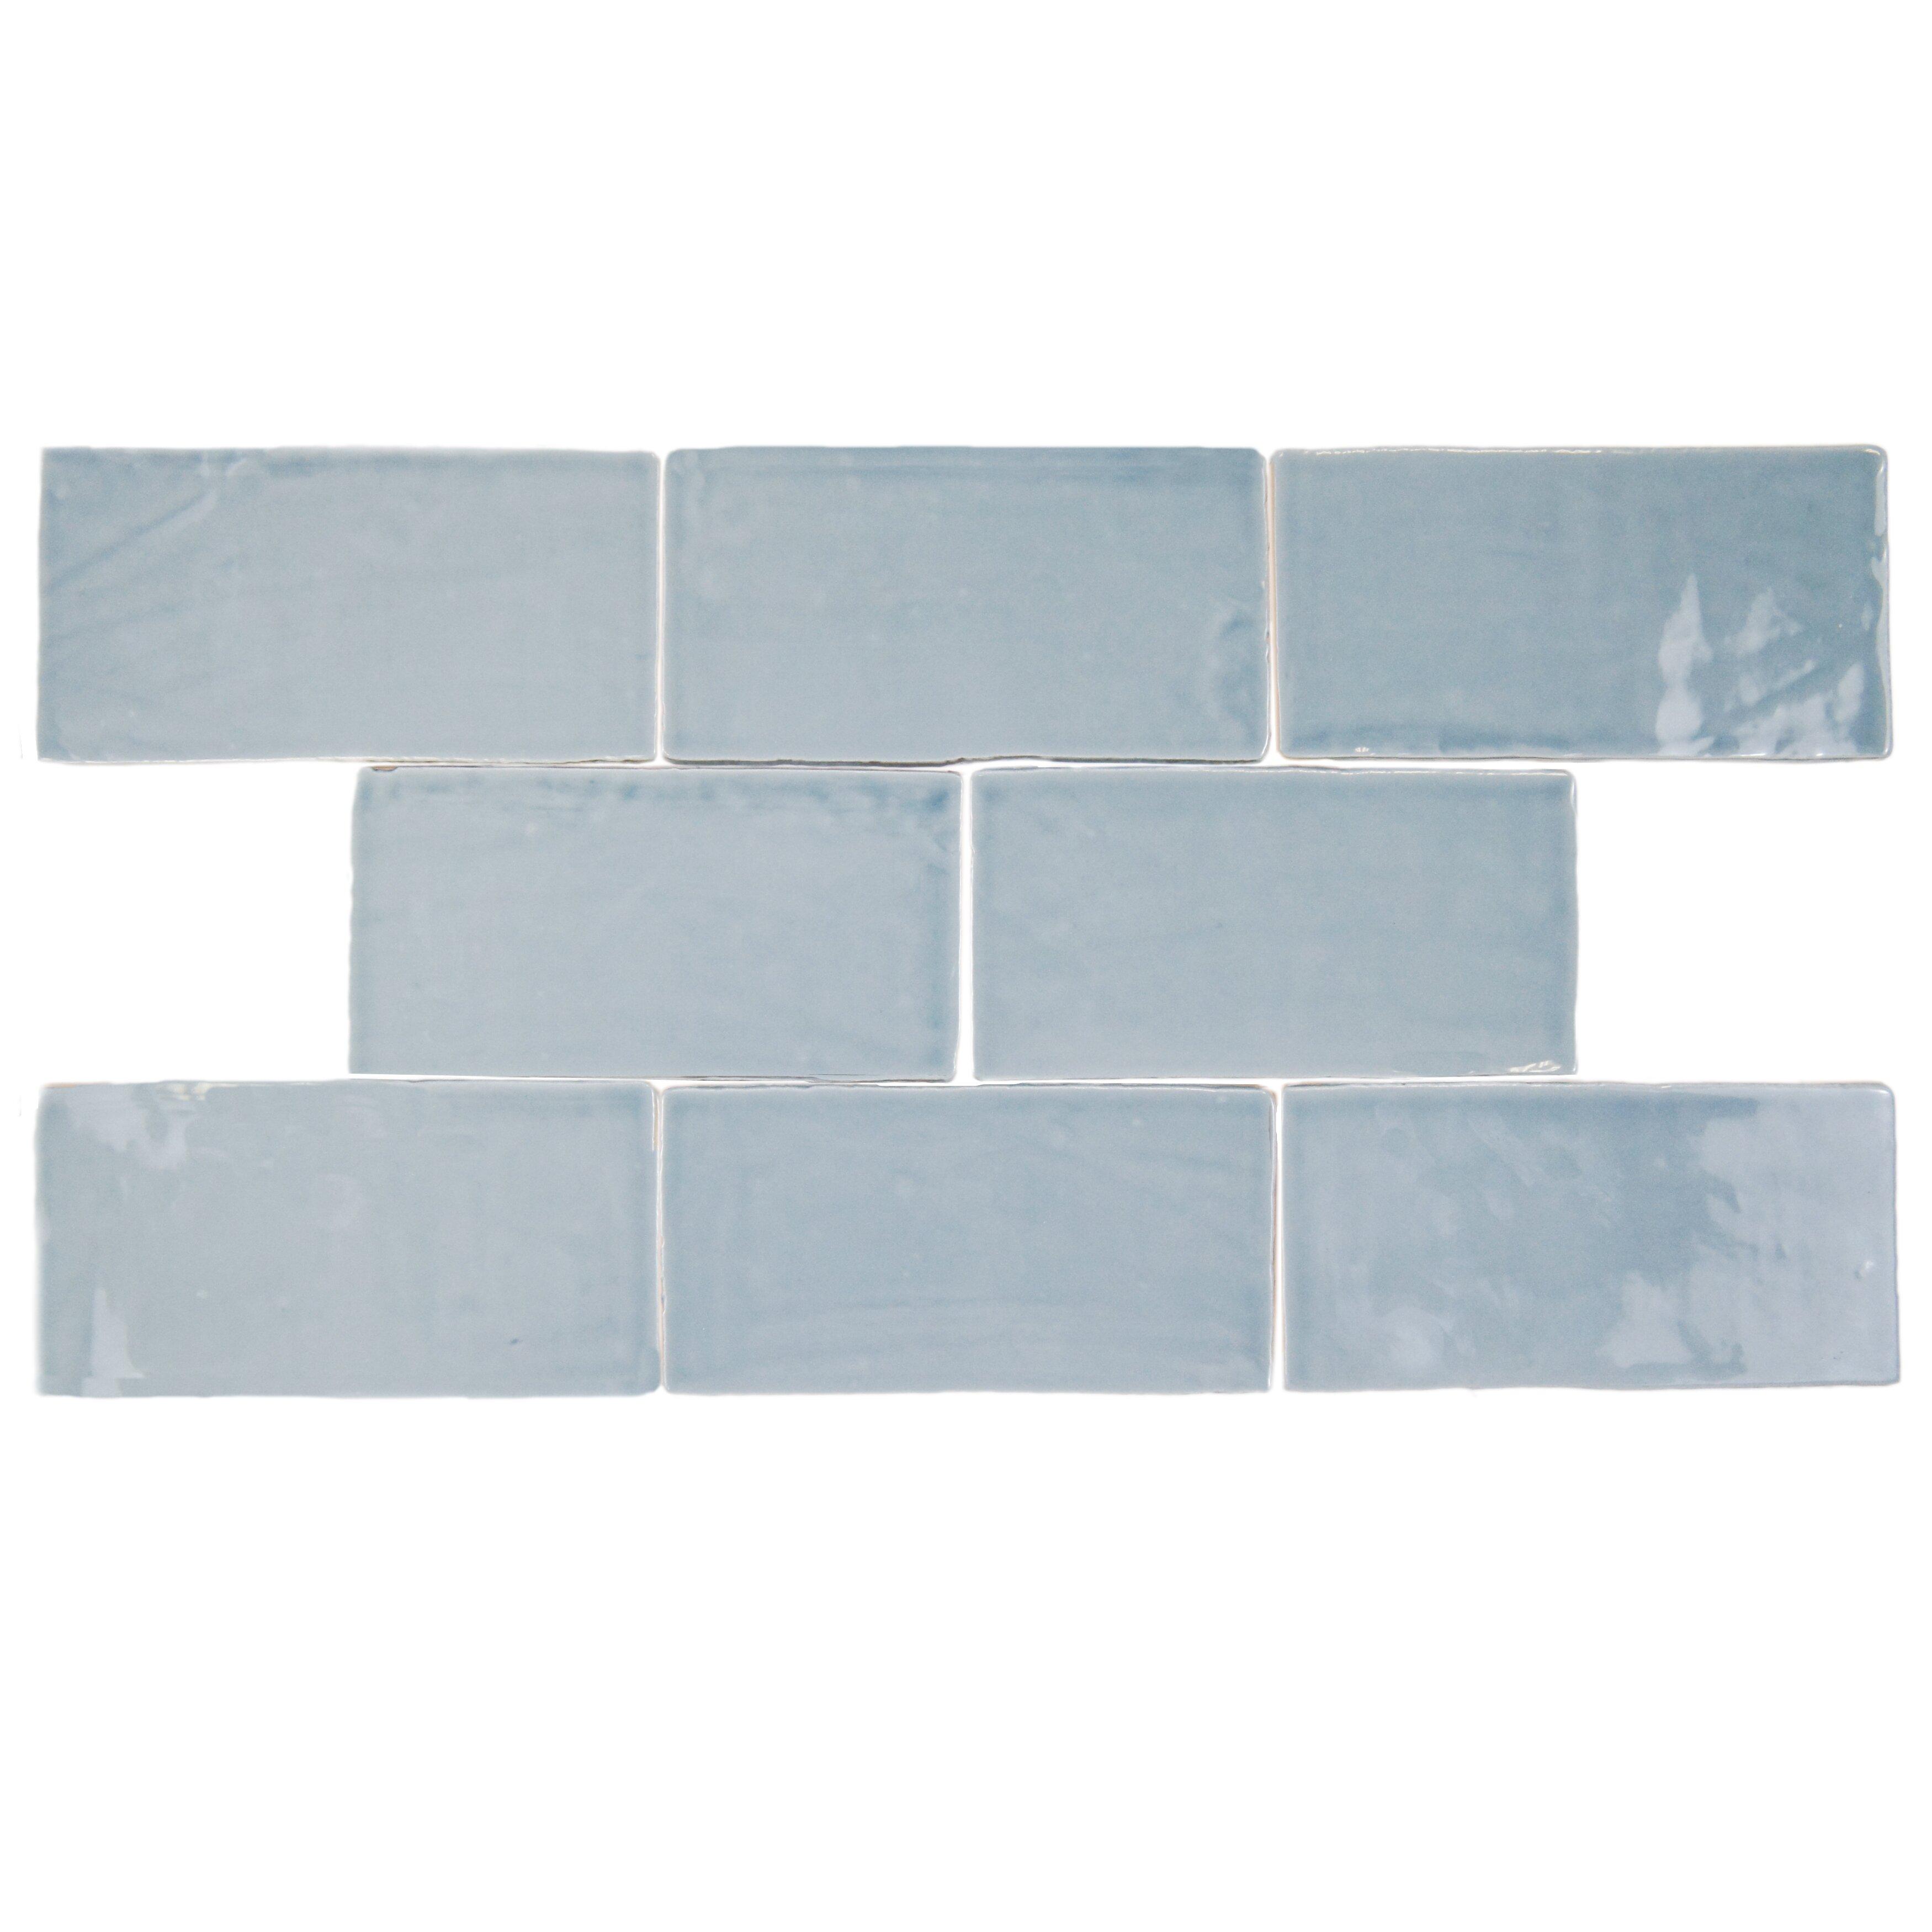 Elitetile Tivoli 3 Quot X 6 Quot Ceramic Subway Tile In Aqua Amp Reviews Wayfair